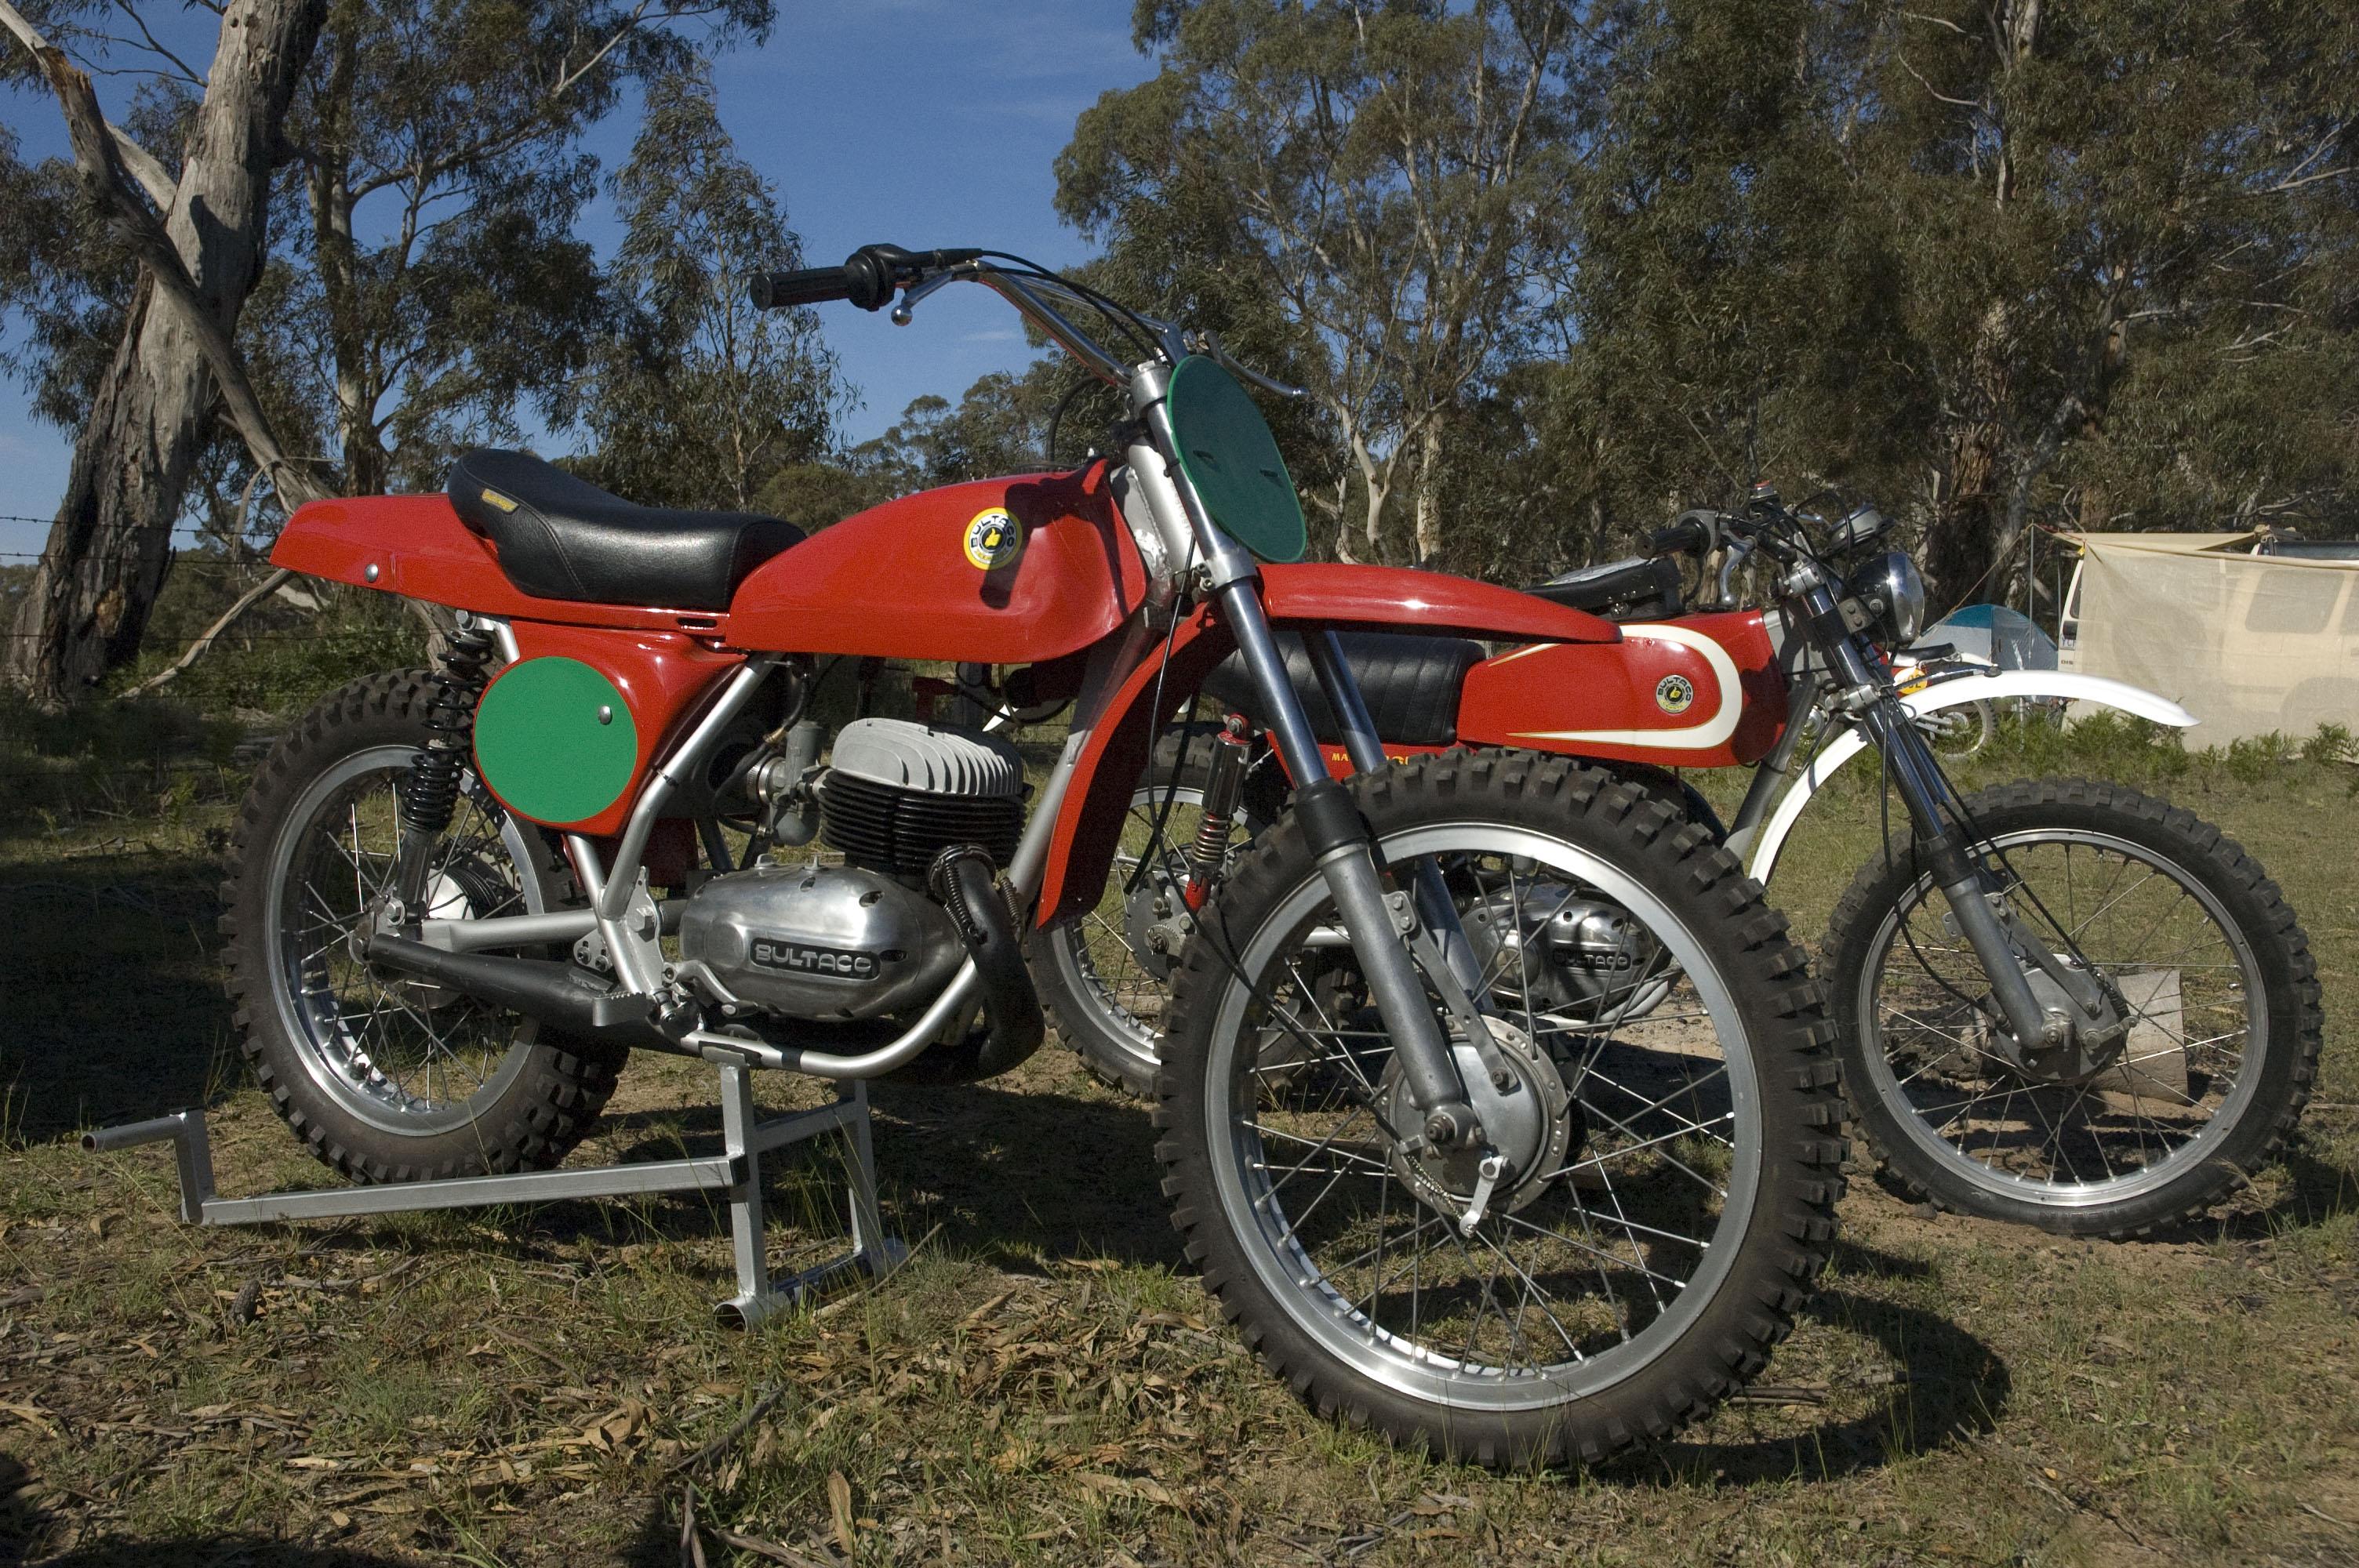 Bultaco Pursang Mk 3